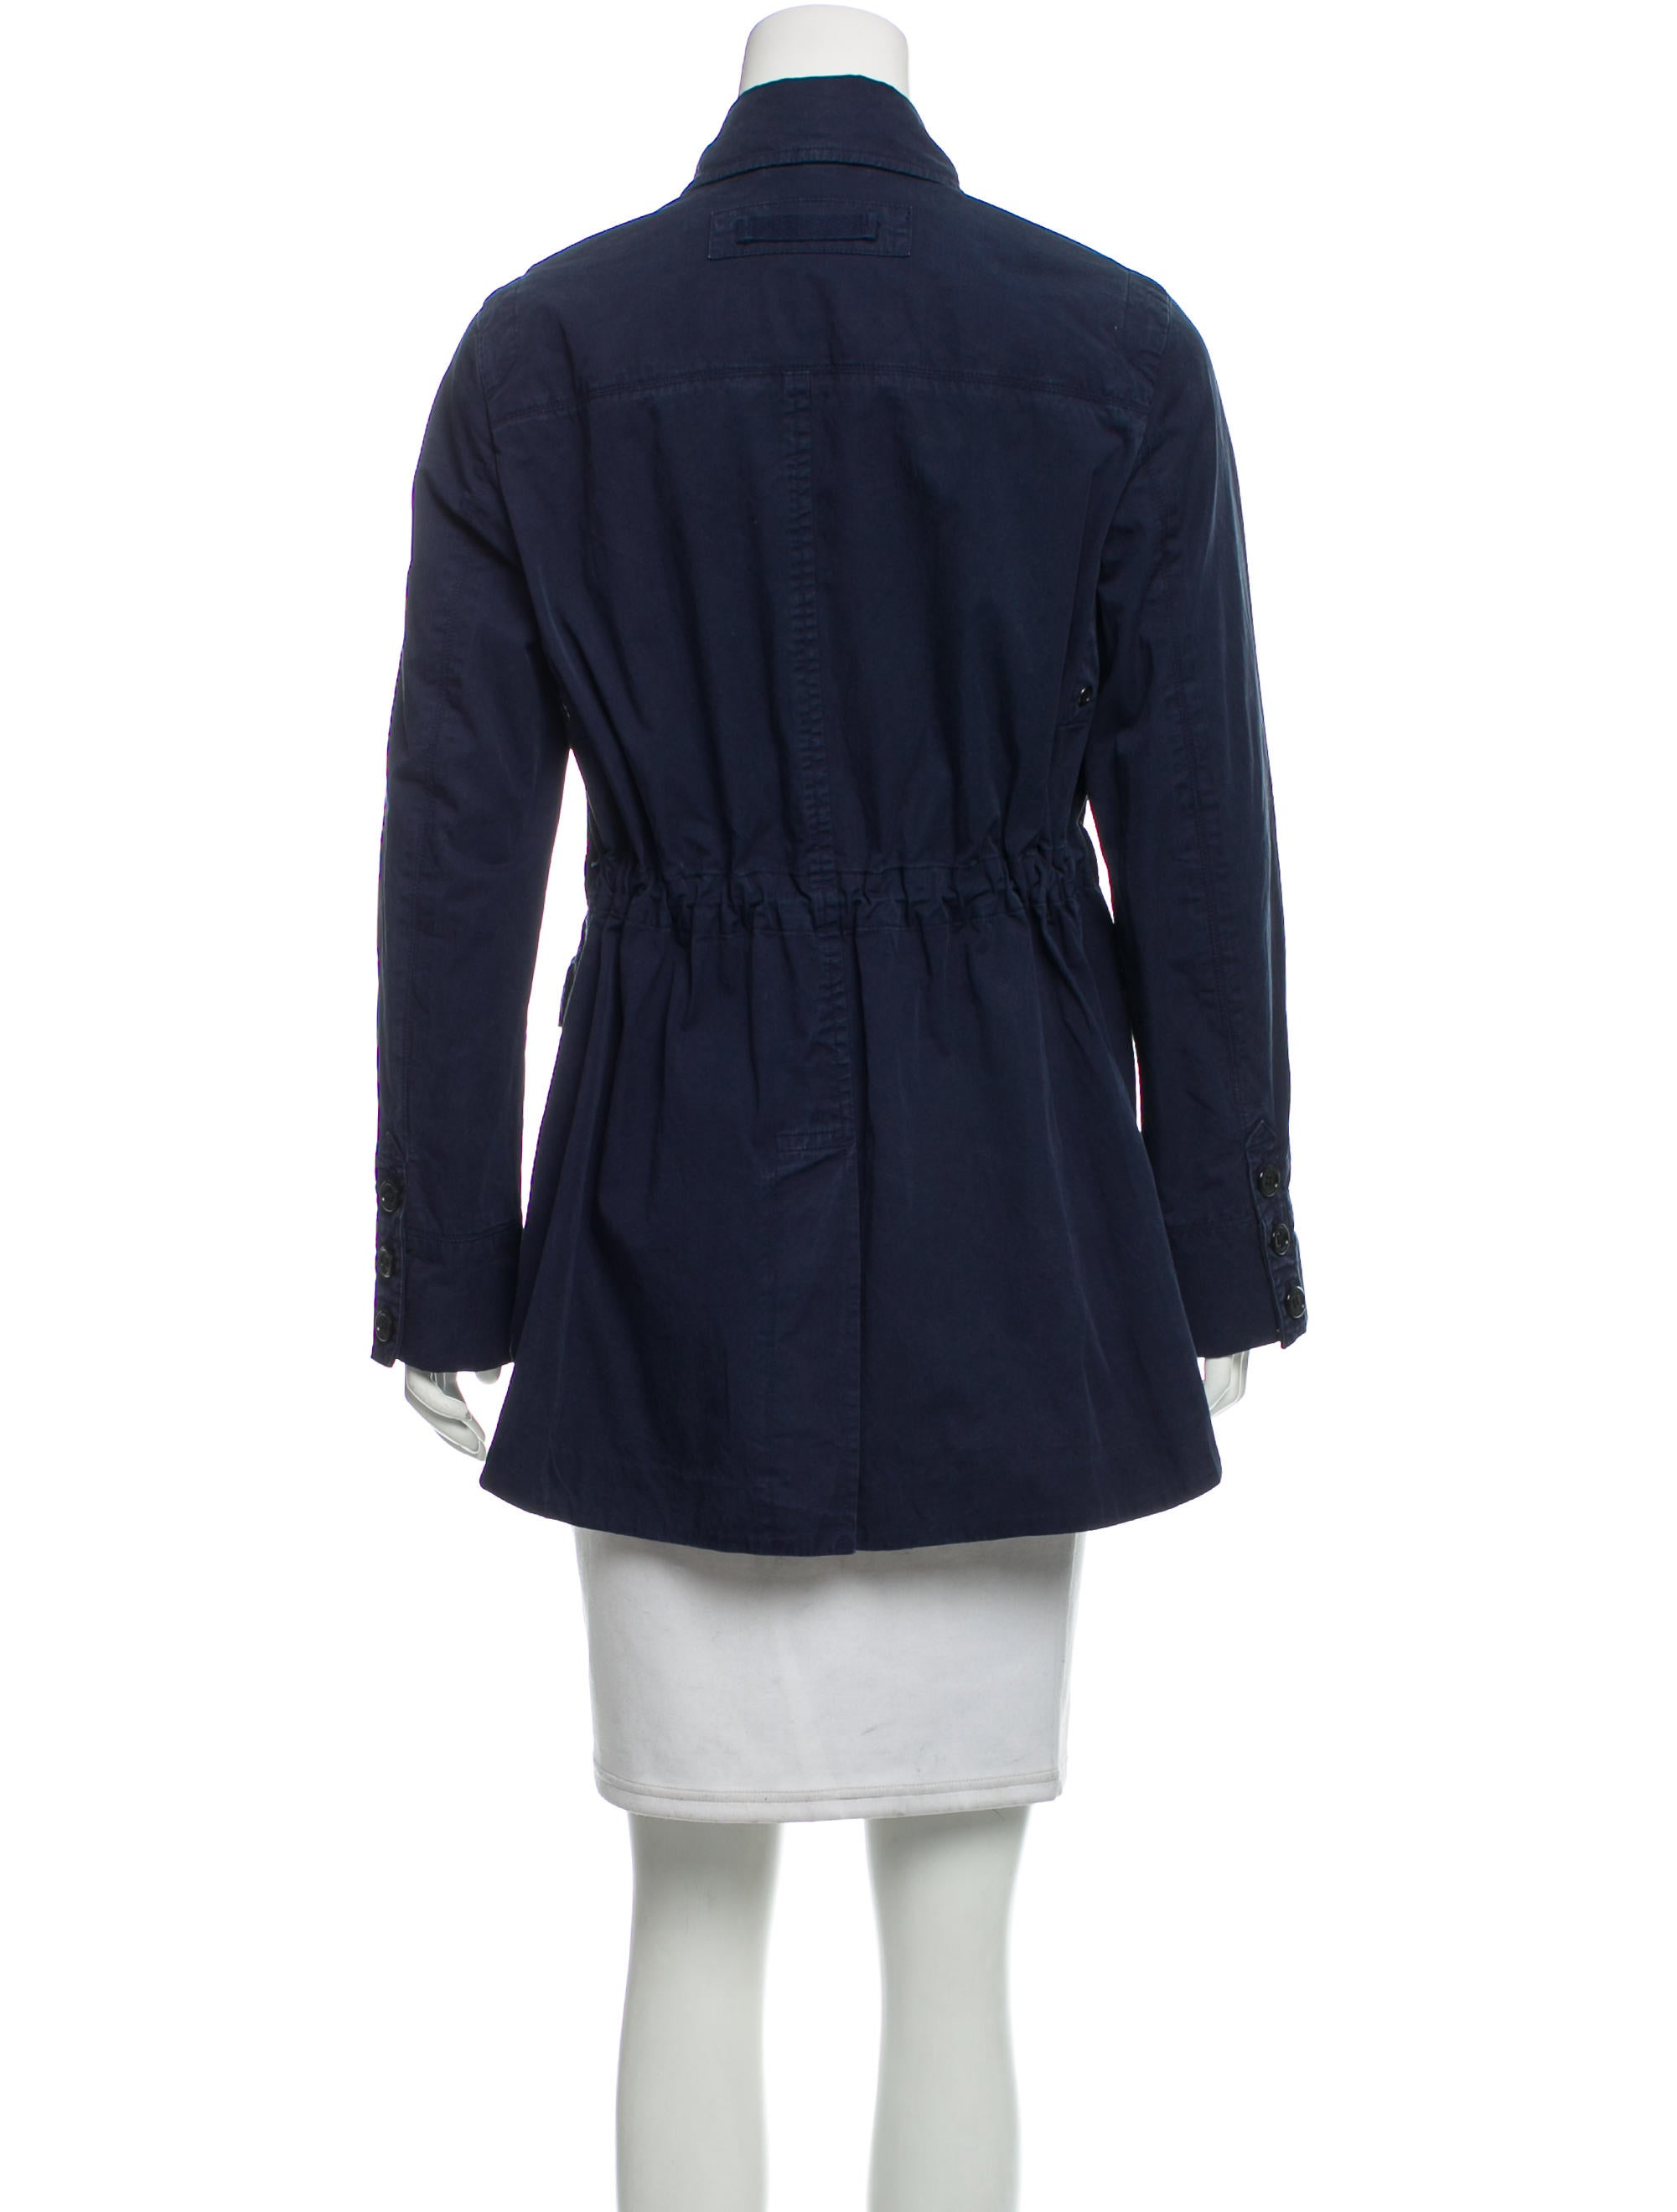 Burberry Brit Lightweight Long Sleeve Jacket Clothing